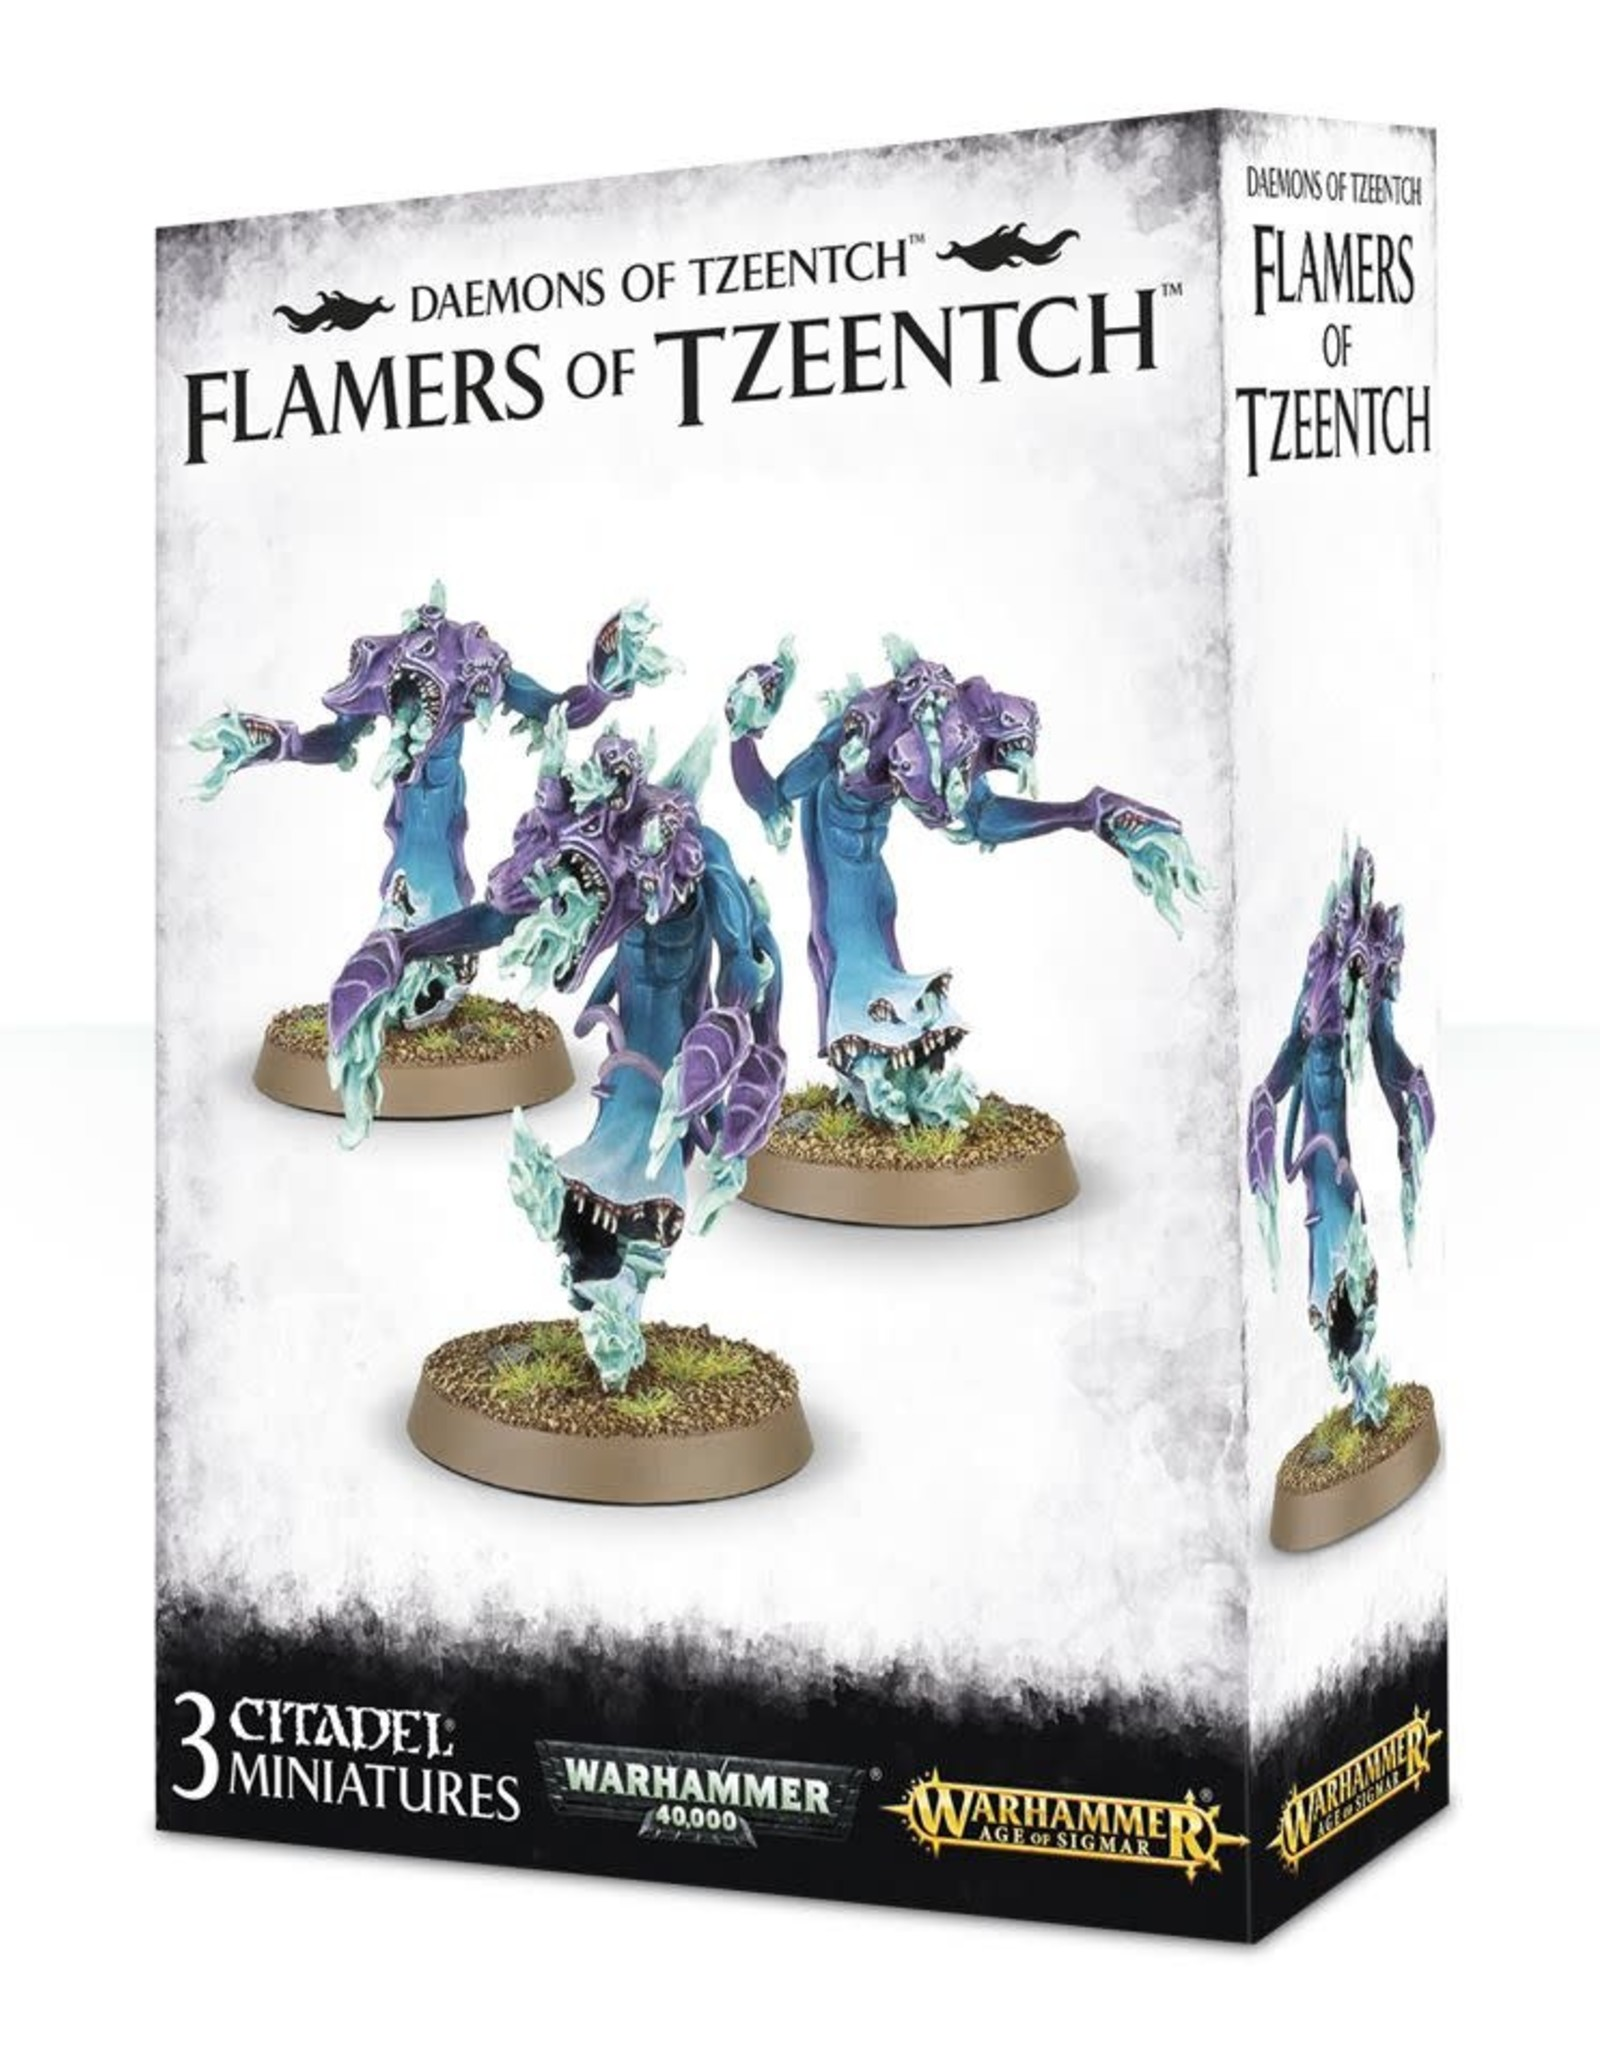 Daemons of Tzeentch: Flamers of Tzeentch